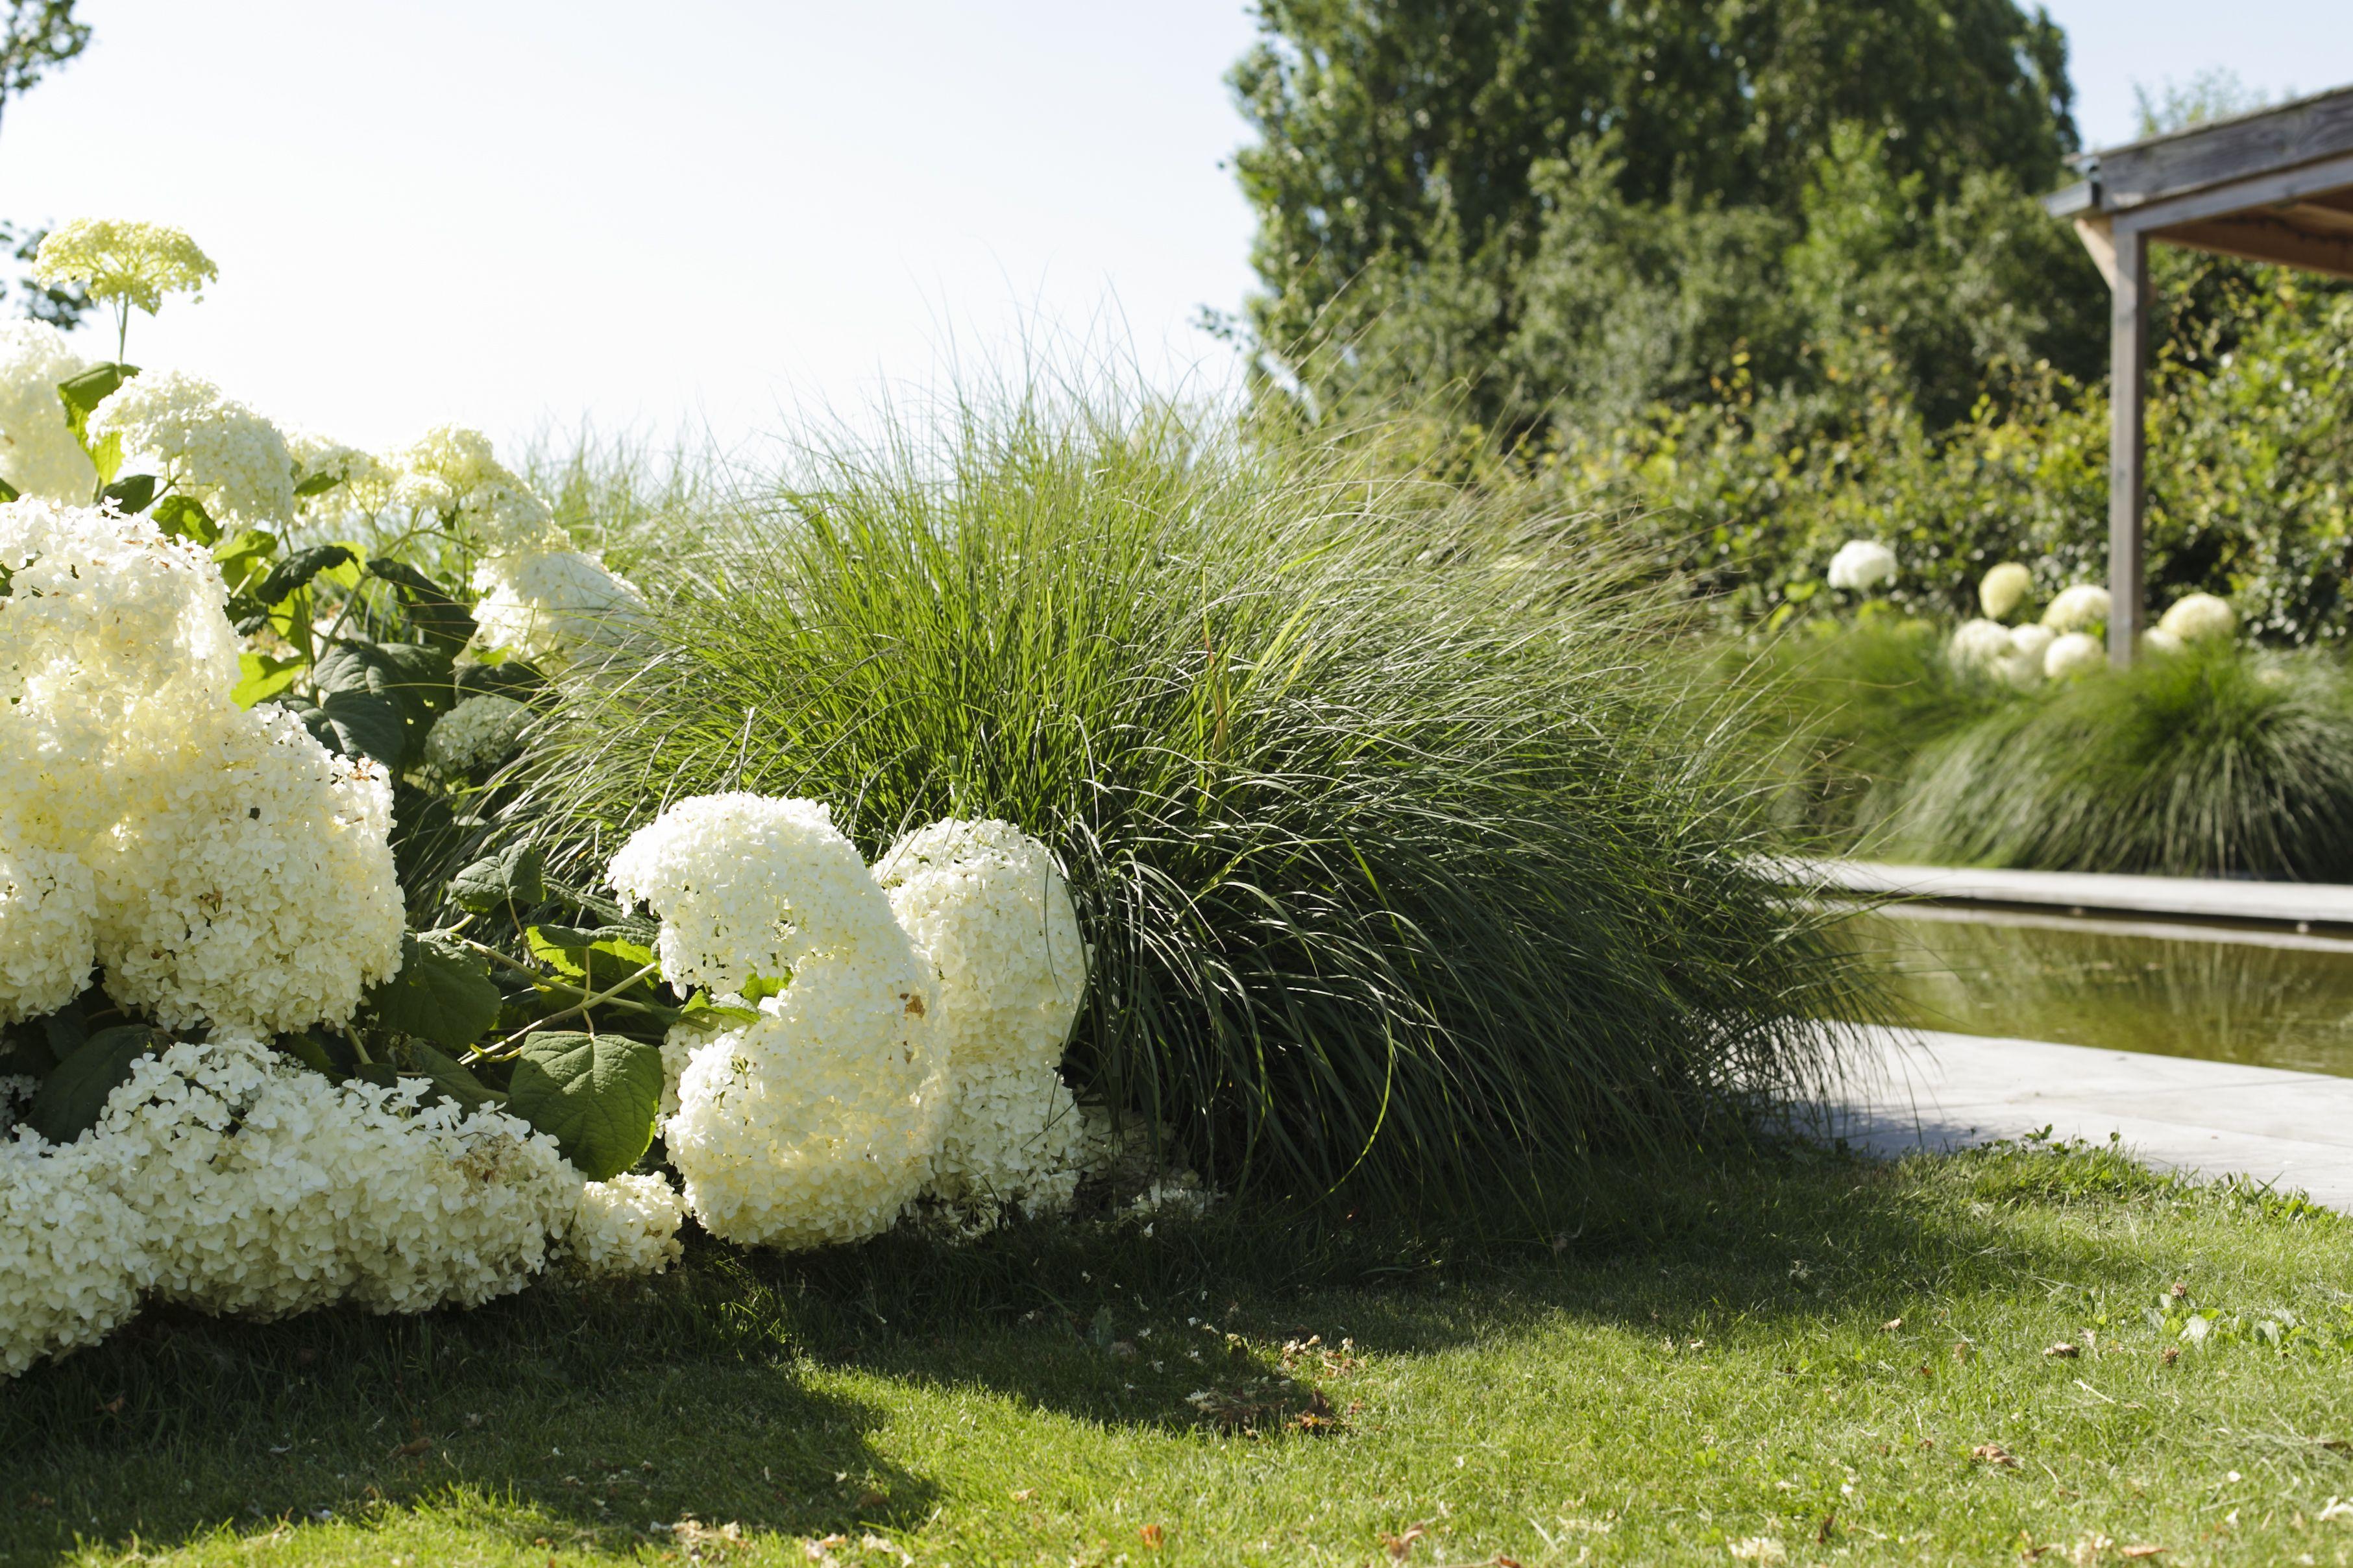 pingl par chlo l a sur au jardin pinterest le jardin jardins et fleur. Black Bedroom Furniture Sets. Home Design Ideas